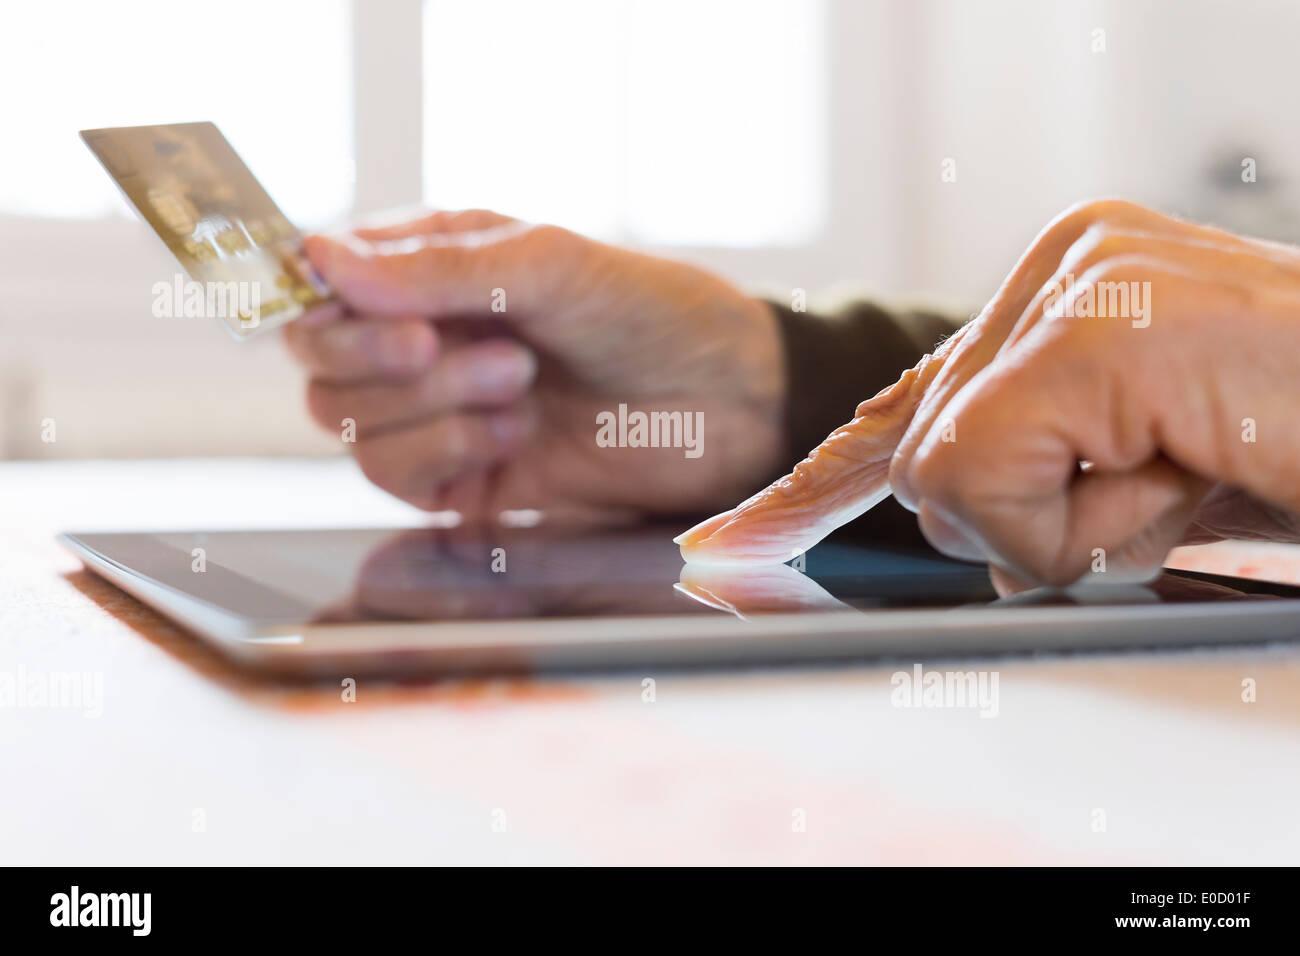 Reife Frauen-digital-Tablette Closeup Hände Plastikkarte Shop im Haus Stockbild